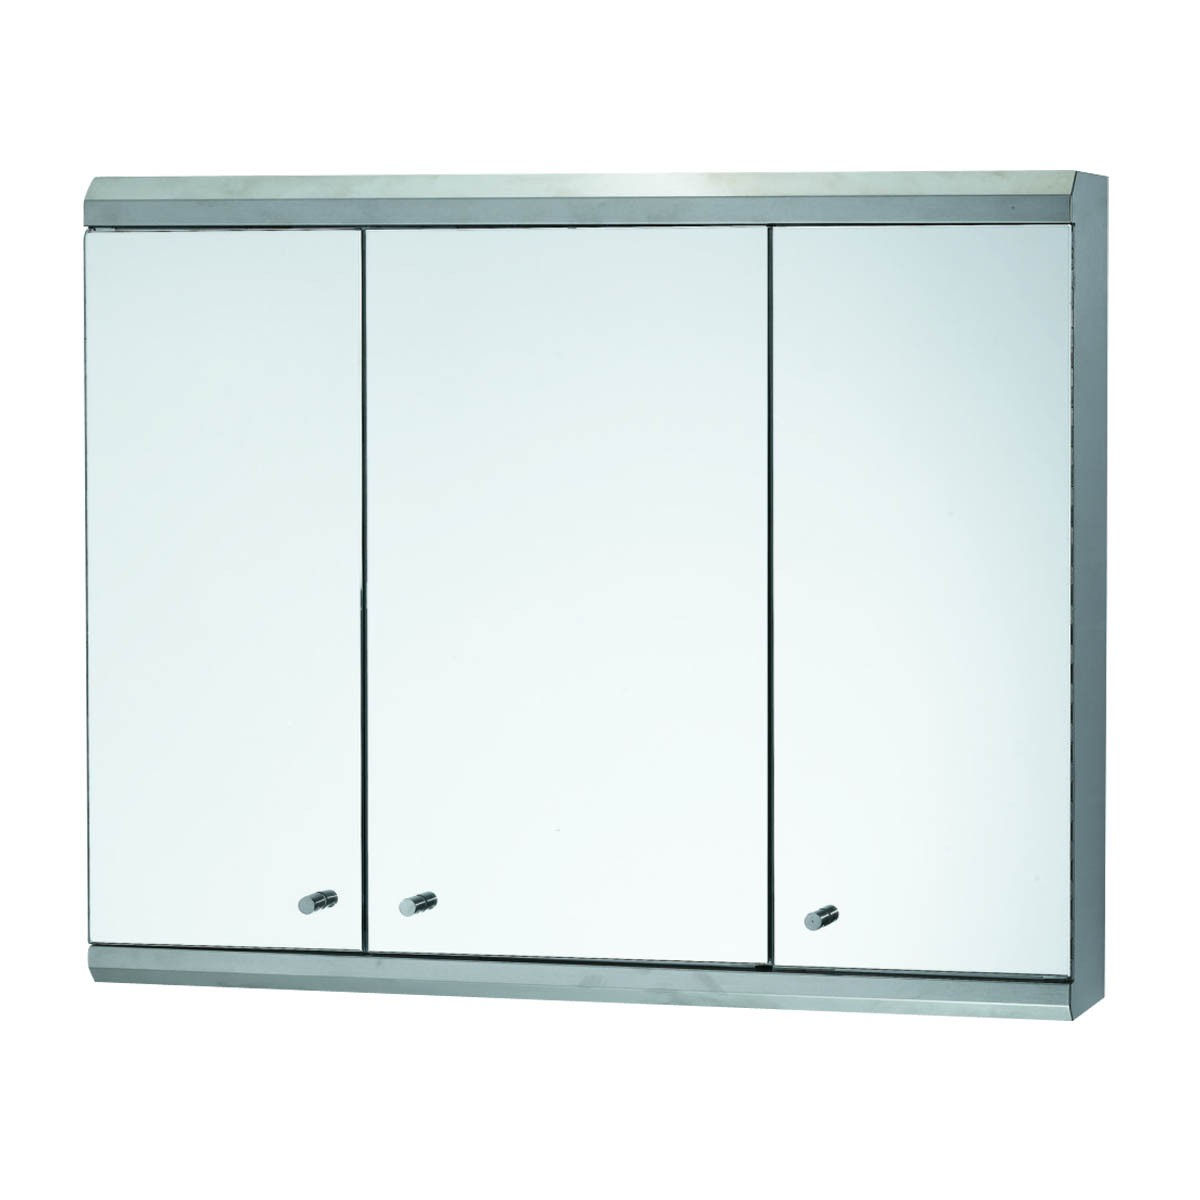 ... U003cPREu003e48inch Medicine Cabinet Three Door Brushed Stainless Steel ...